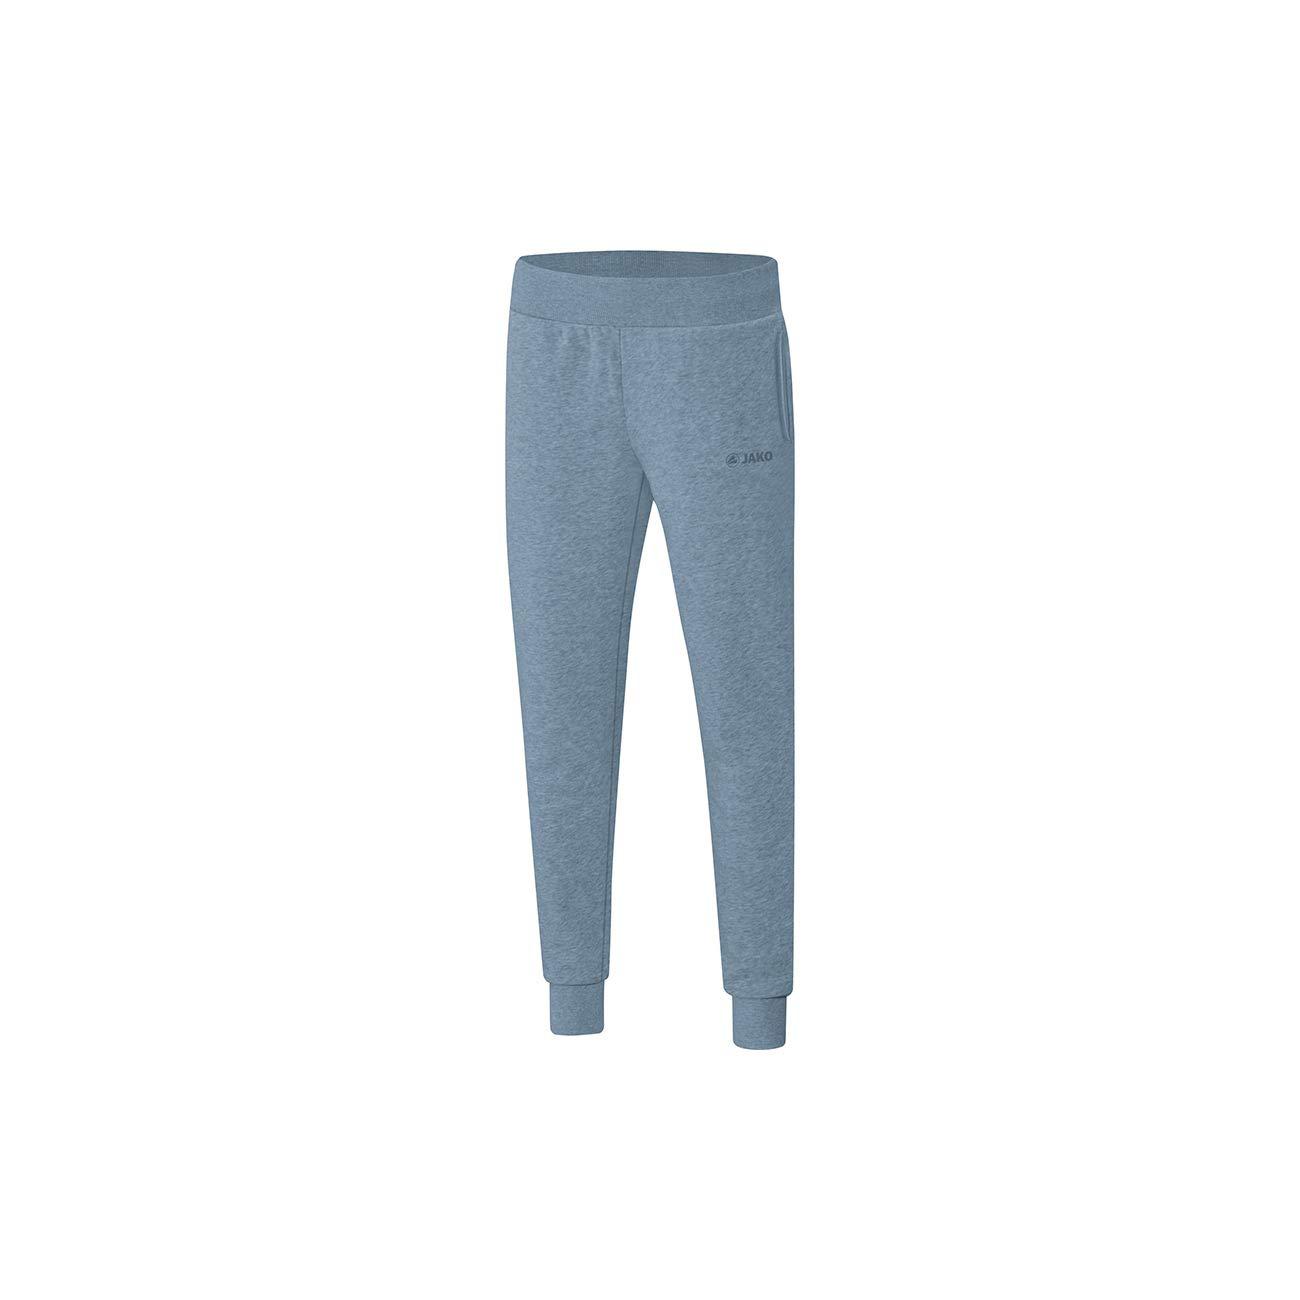 JAKO Basic - Pantalones de chándal para Mujer: Amazon.es: Ropa y ...